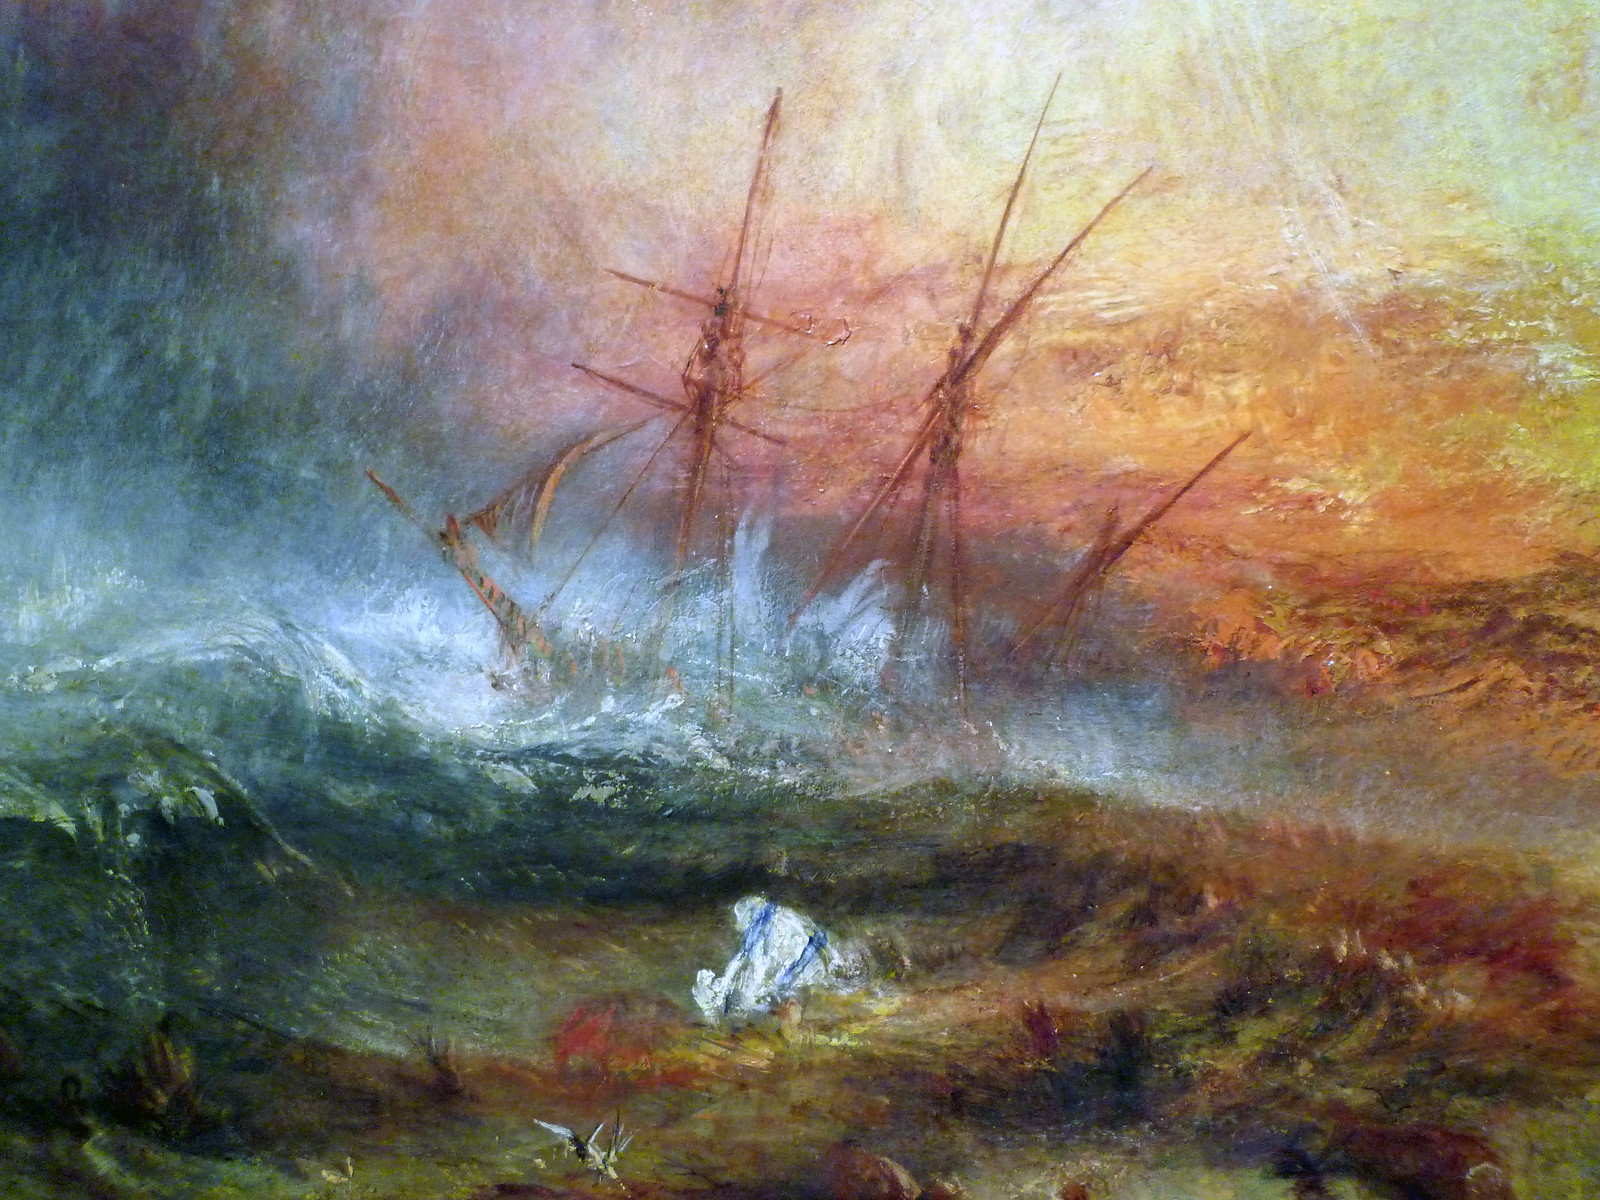 JMW Turner, Slave Ship, detail of ship | by profzucker